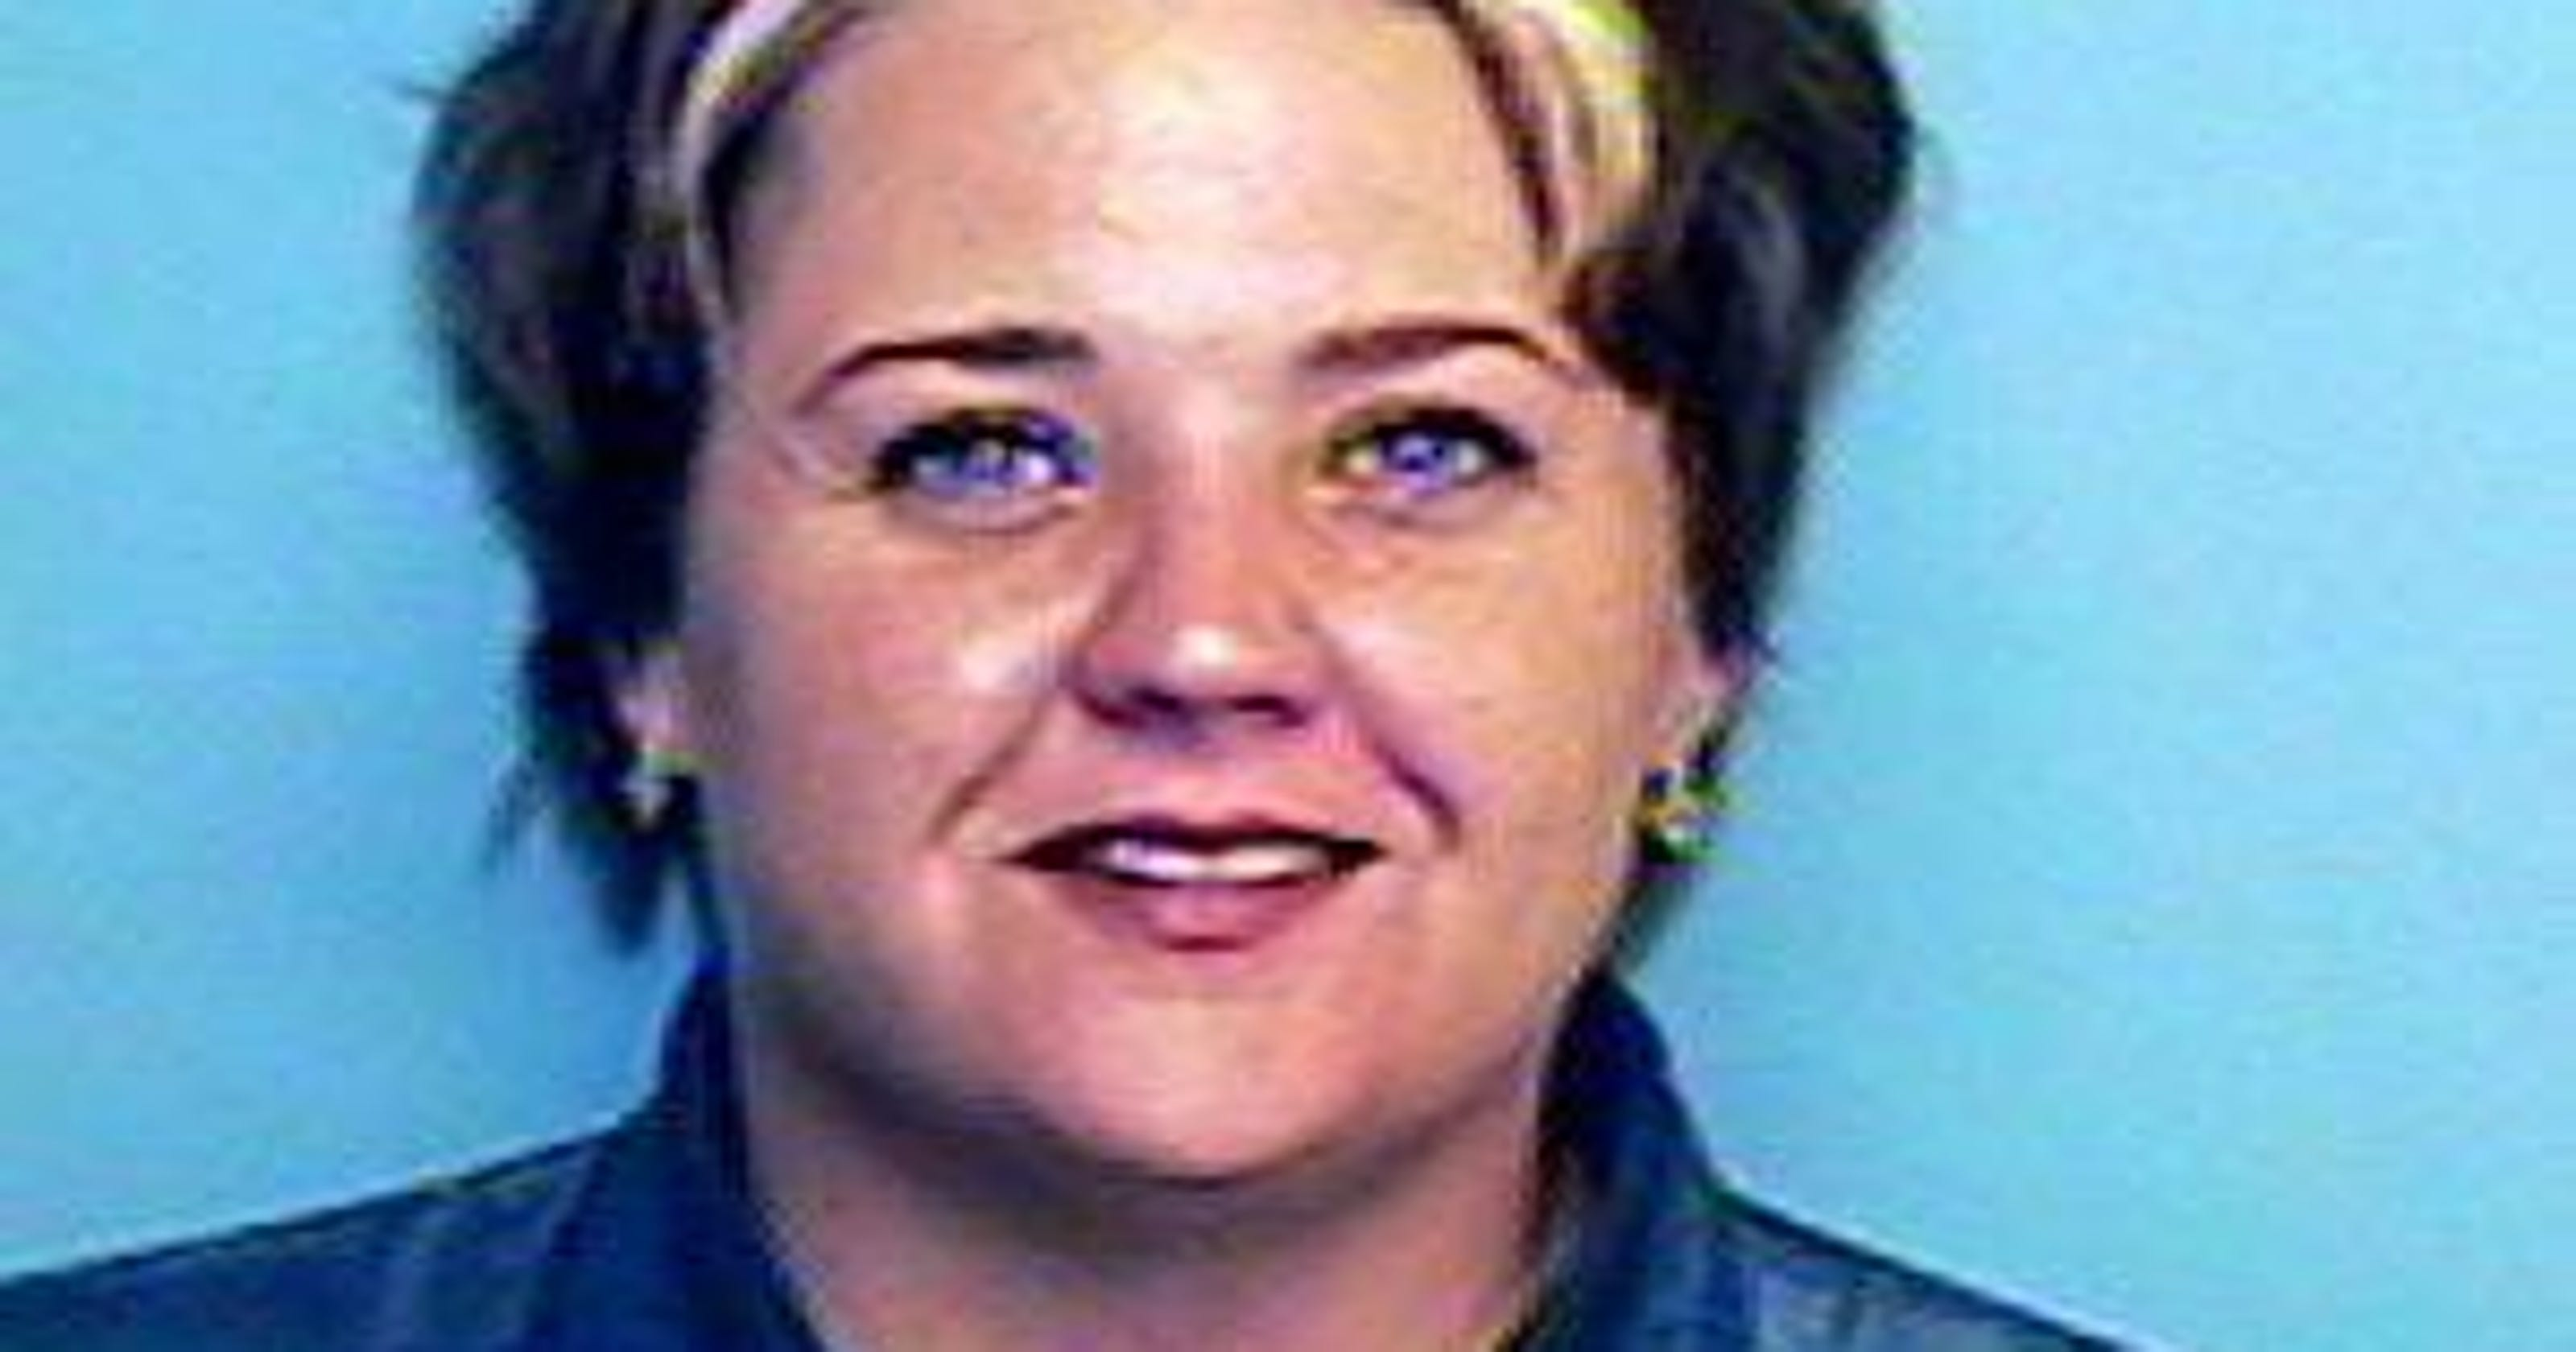 Phoenix police believe '07 murders linked